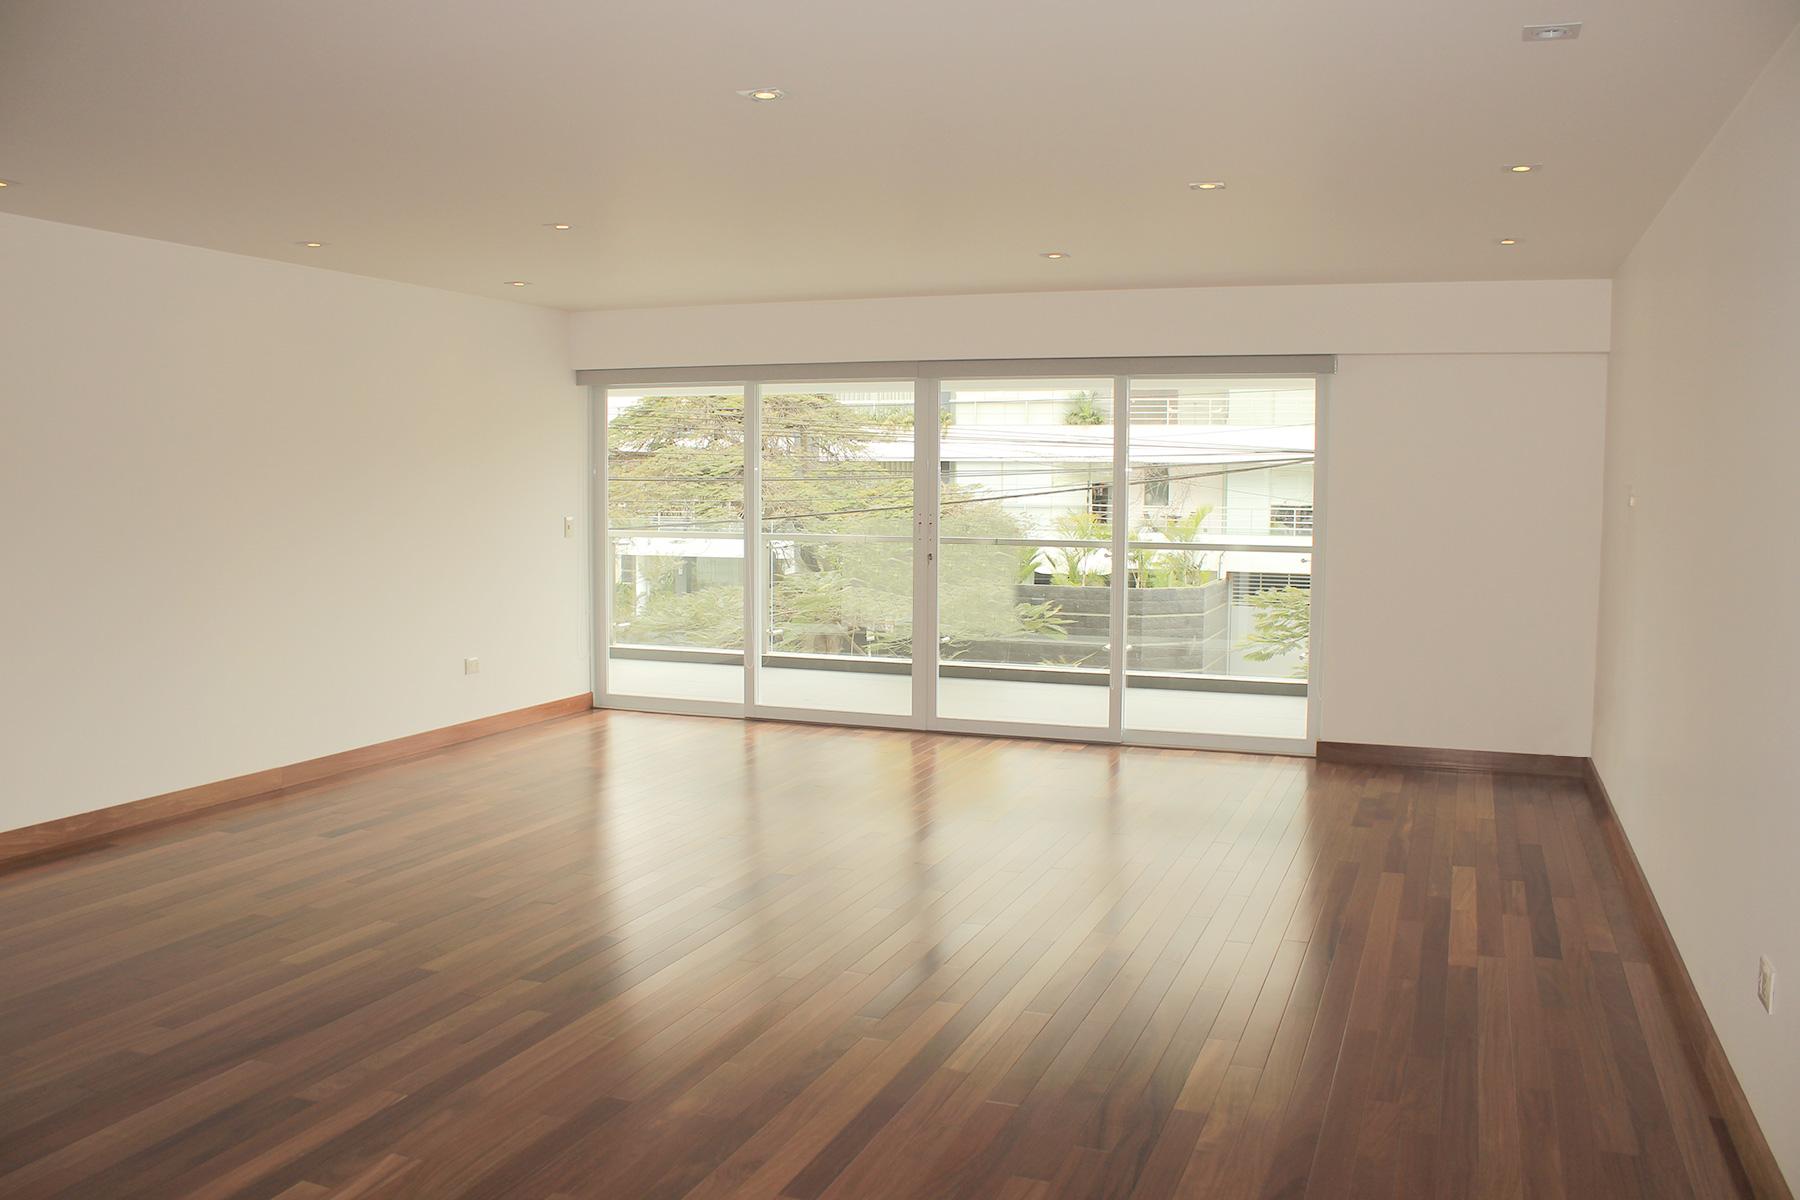 Apartment for Sale at Exclusivo Departamento en Venta Av. Jorge Basadre San Isidro, Lima, 27 Peru